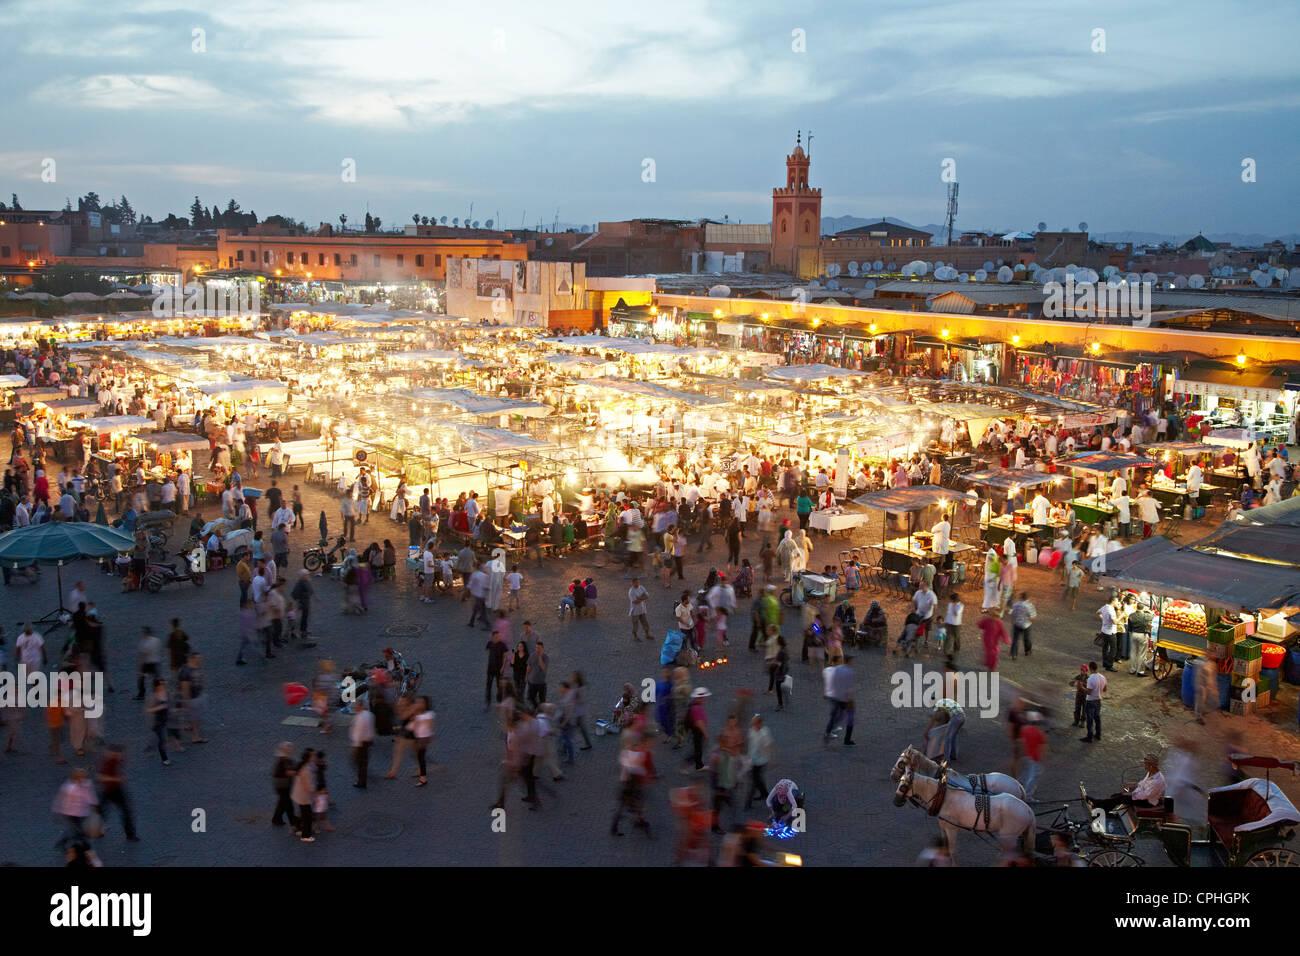 Jamaa El-Fnaa Square Marrakesh Morocco Stock Photo